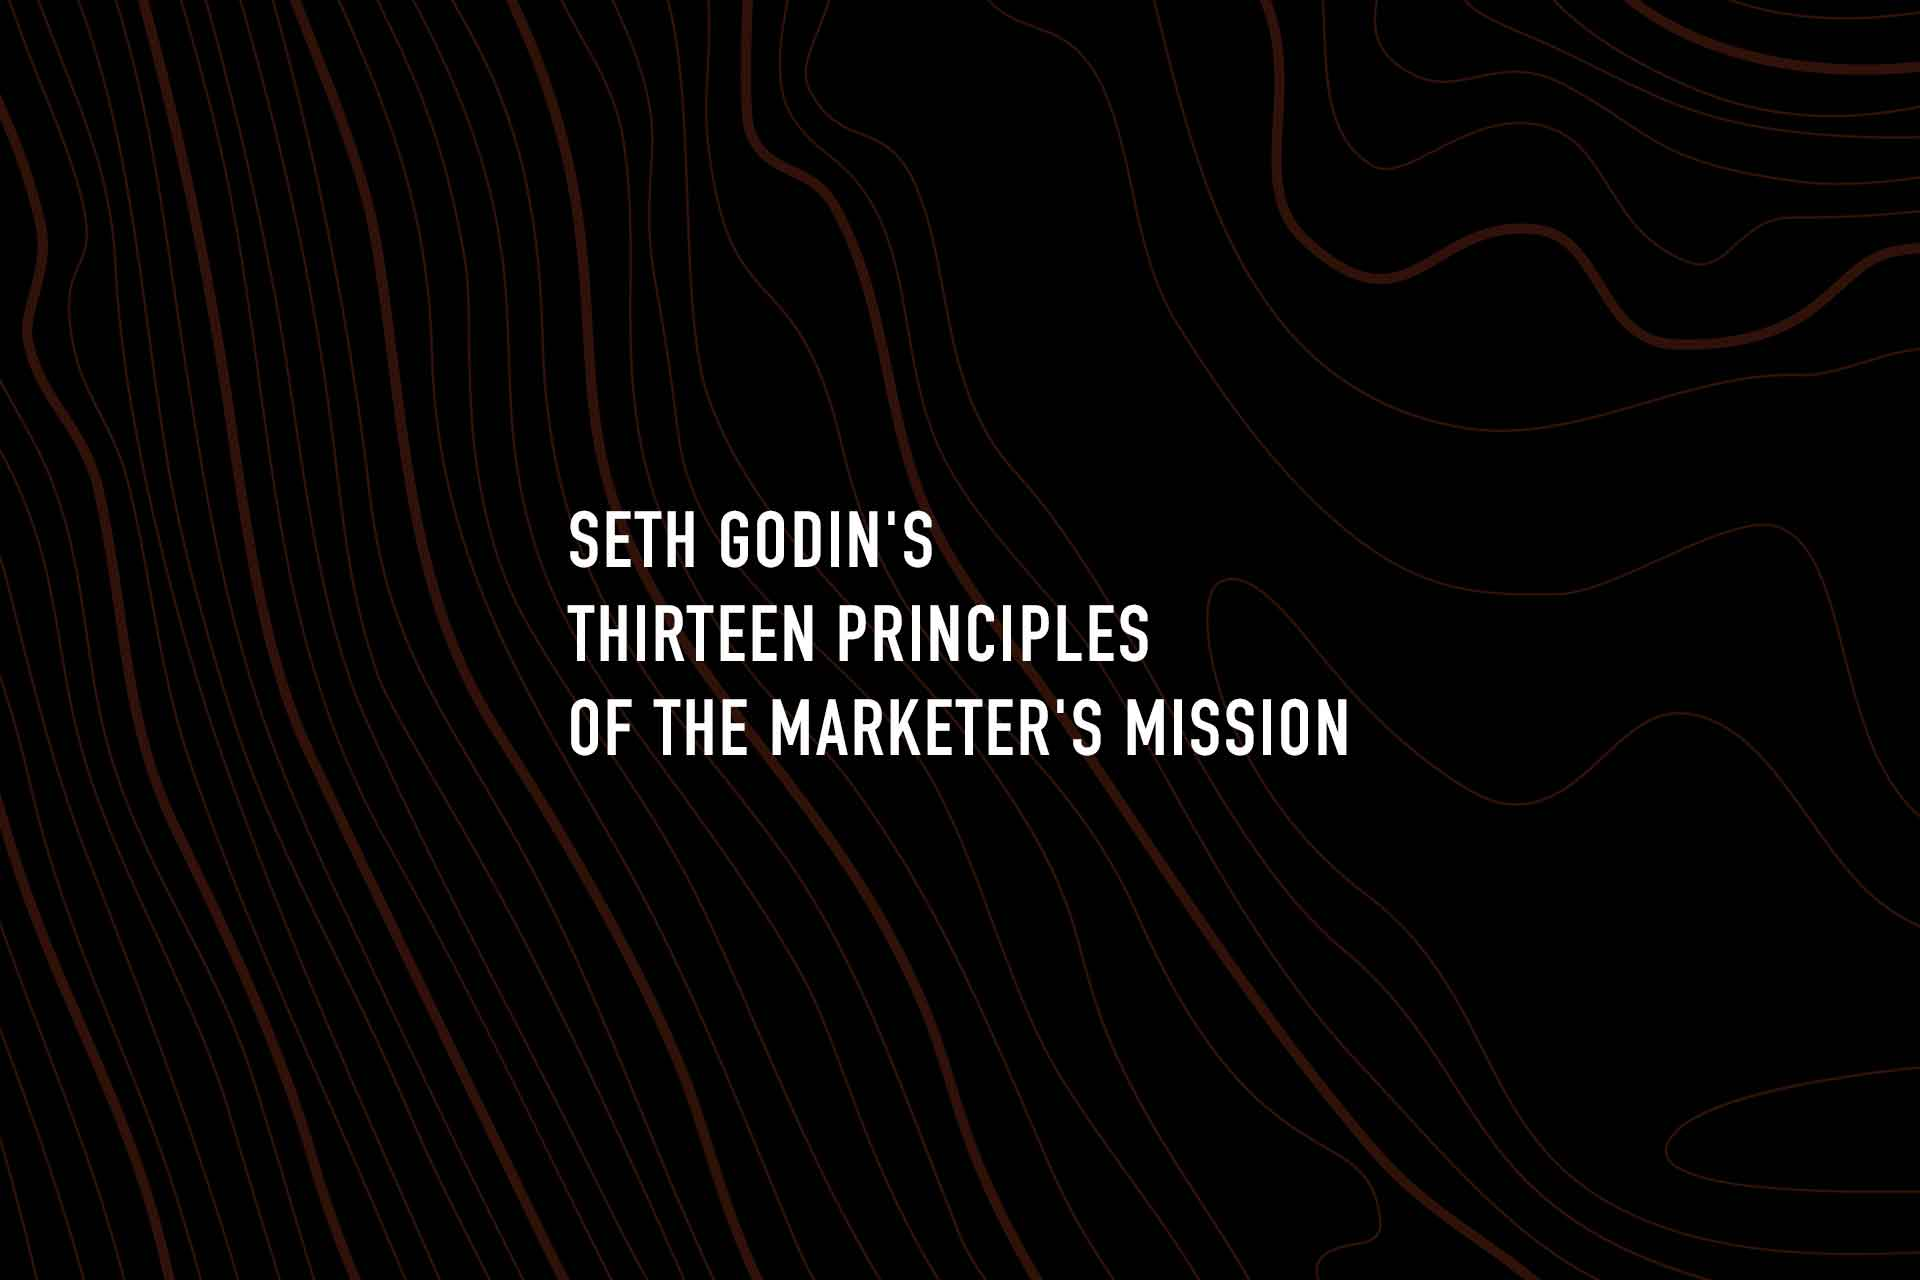 Seth Godin's Thirteen Principles of the Marketer's Mission: 4B Marketing